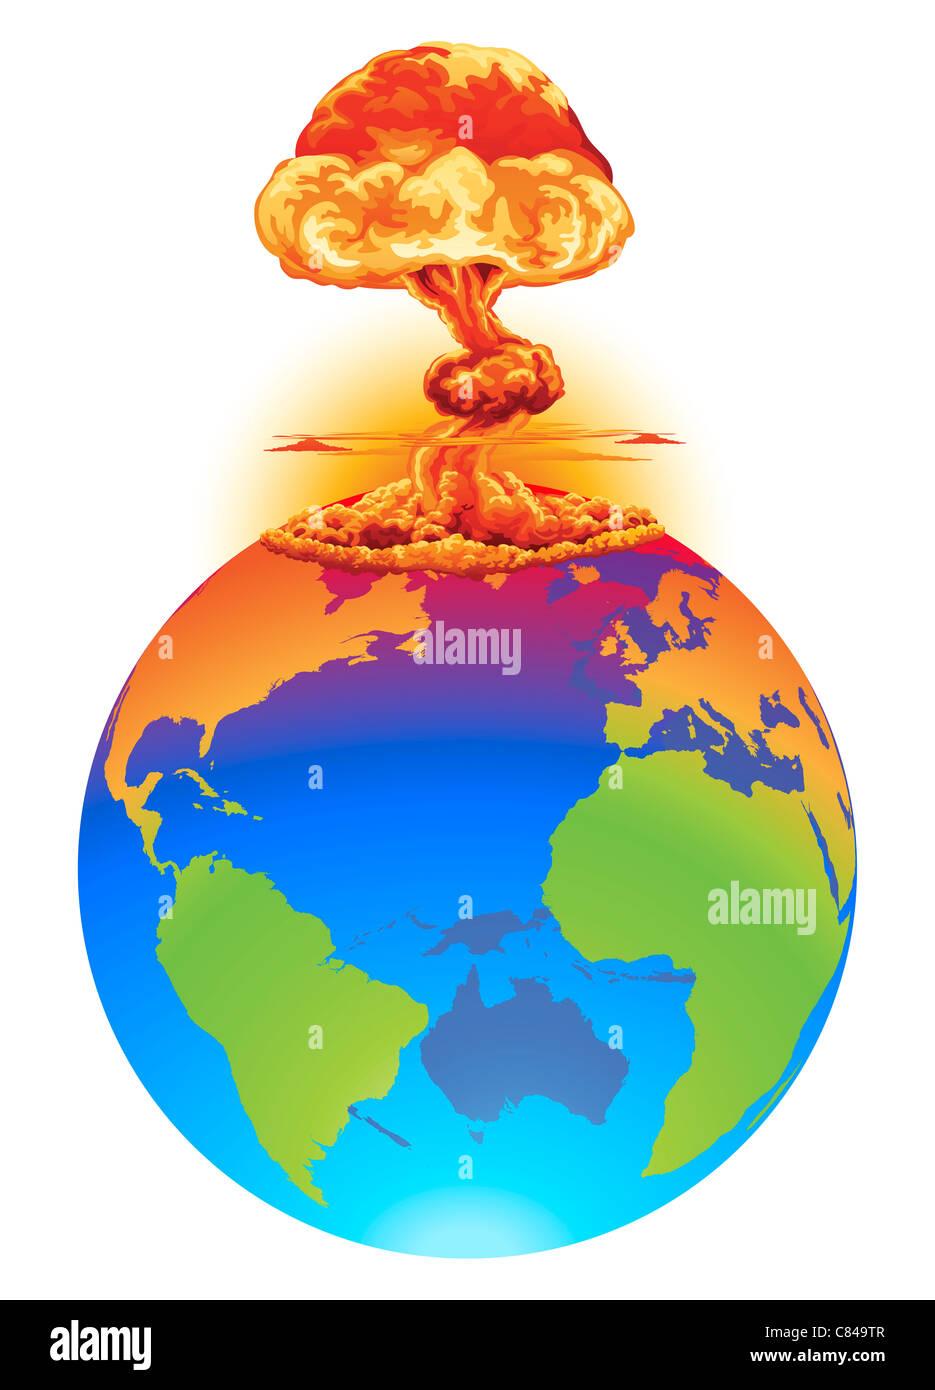 Mushroom World Map.A Mushroom Cloud Explosion On The World Globe Concept Global Stock